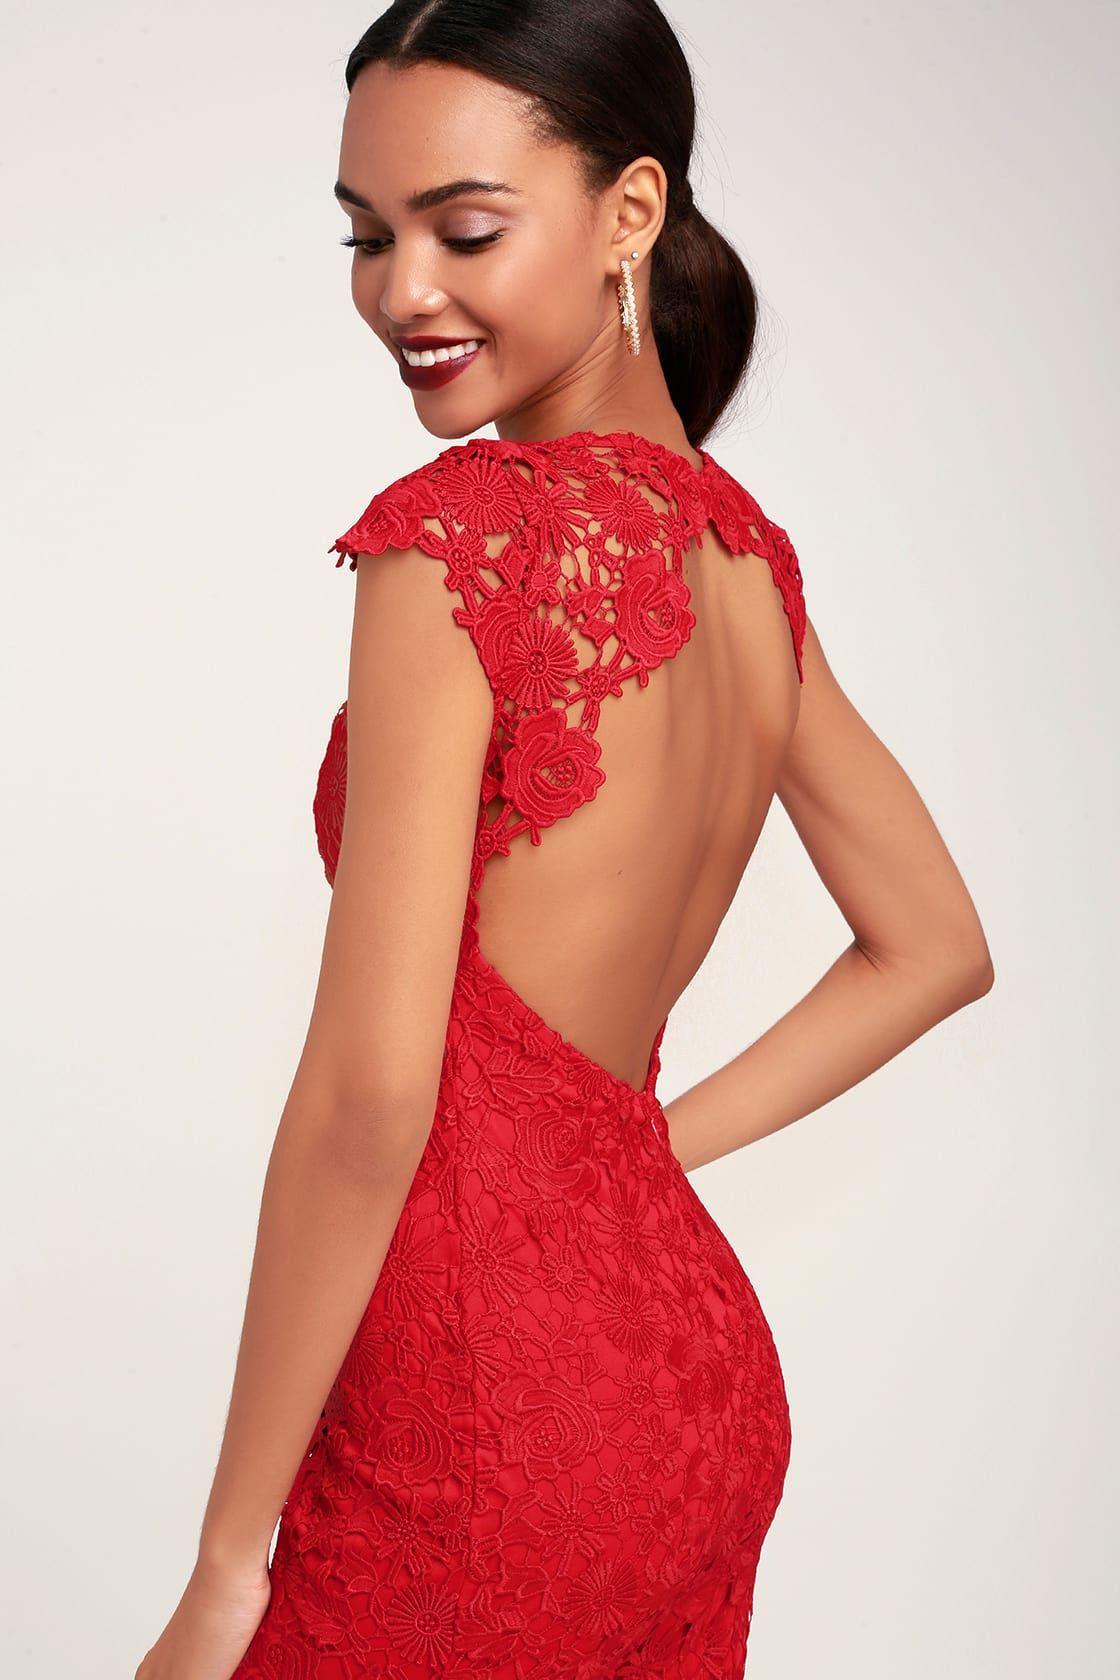 Romance Language Red Backless Lace Dress Backless Lace Dress Red Lace Long Sleeve Dress Red Peplum Dresses